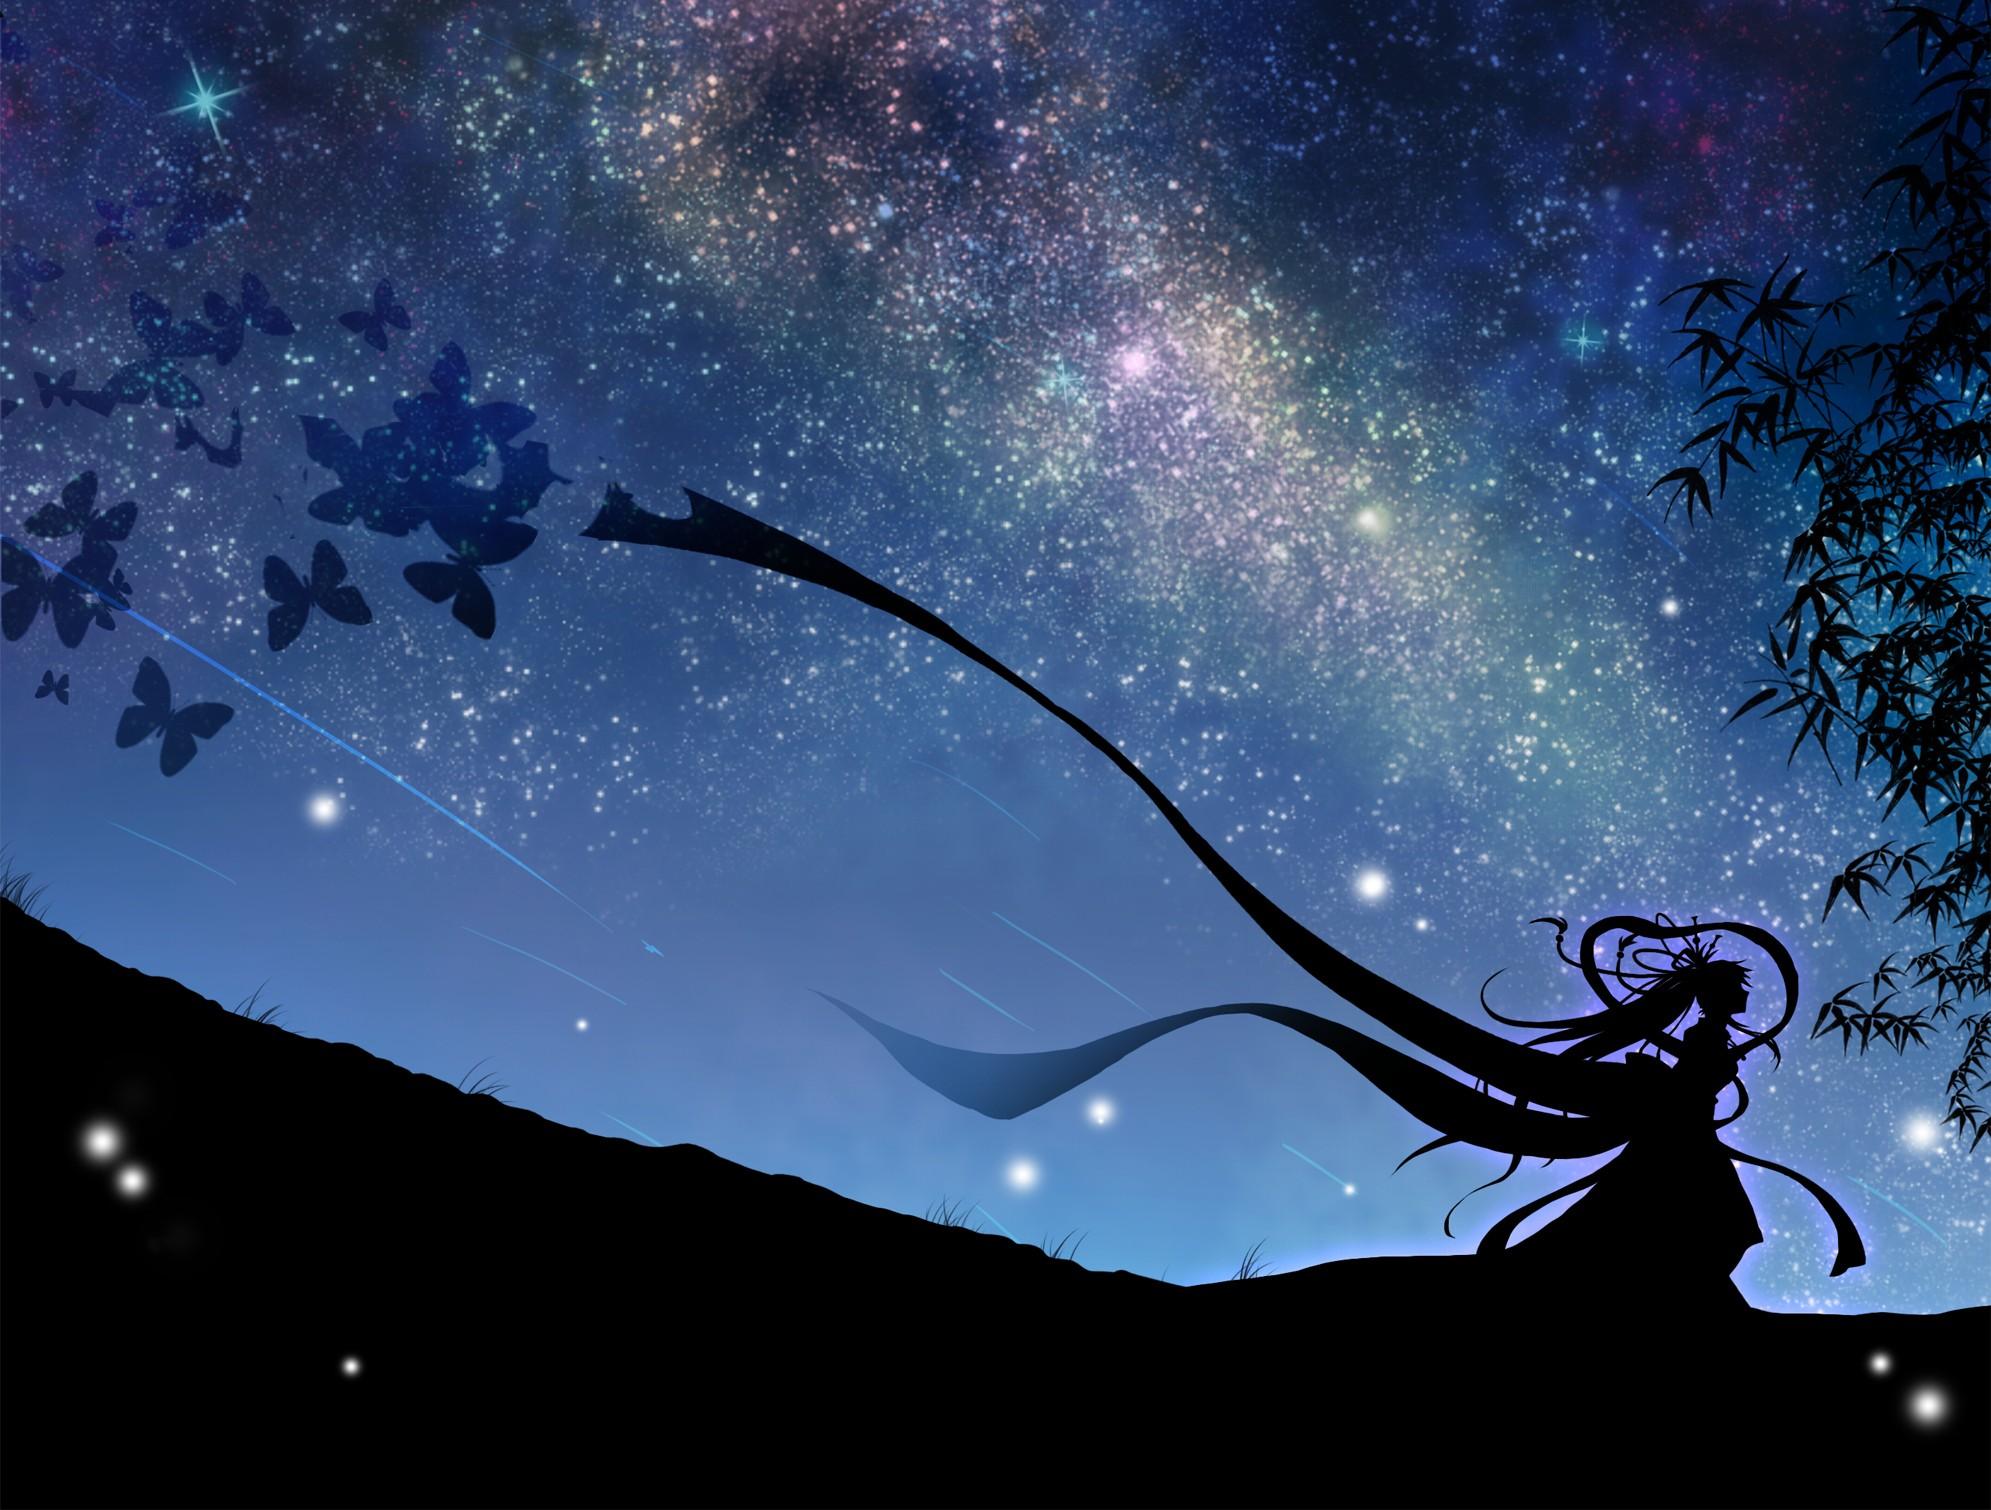 Night Stars Wallpaper 1991x1510 Night Stars Butterfly Skyscapes 1991x1510